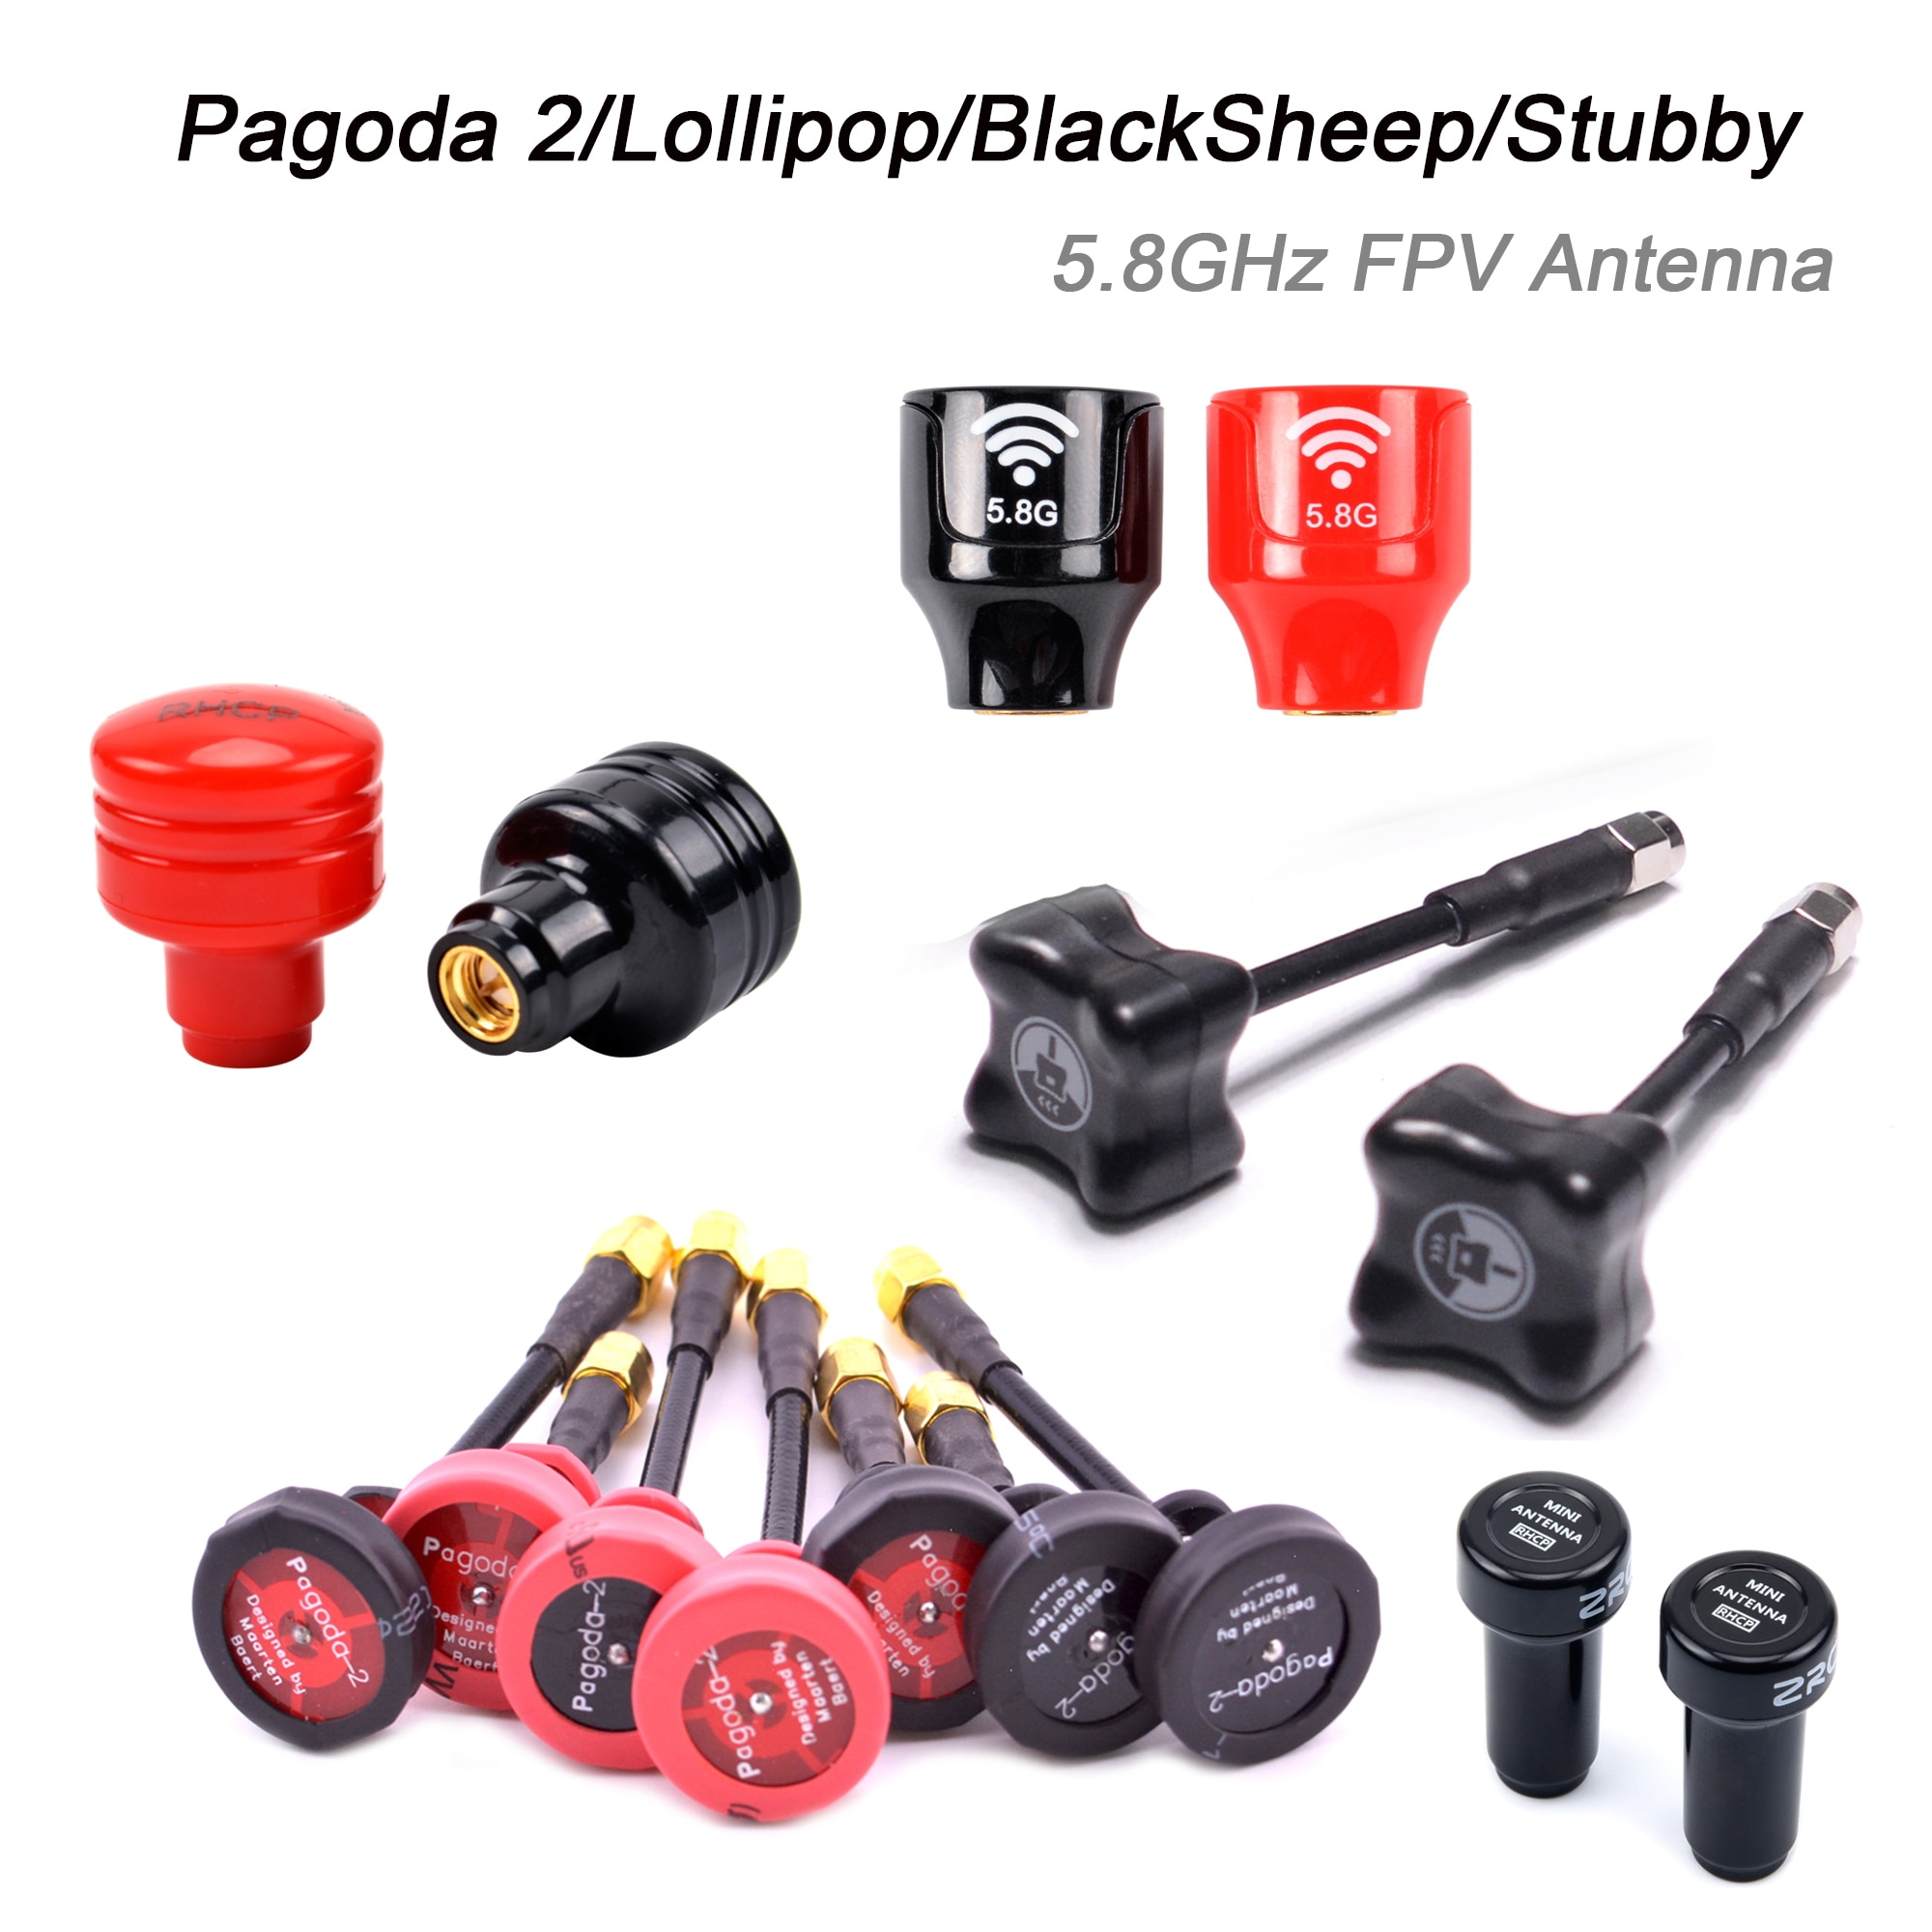 Pgoda 2 / Lollipop / BlackSheep / Stubby 5,8 ГГц FPV антенна SMA / RP-SMA / MMCX / UFL разъем для радиоуправляемого квадрокоптера FPV